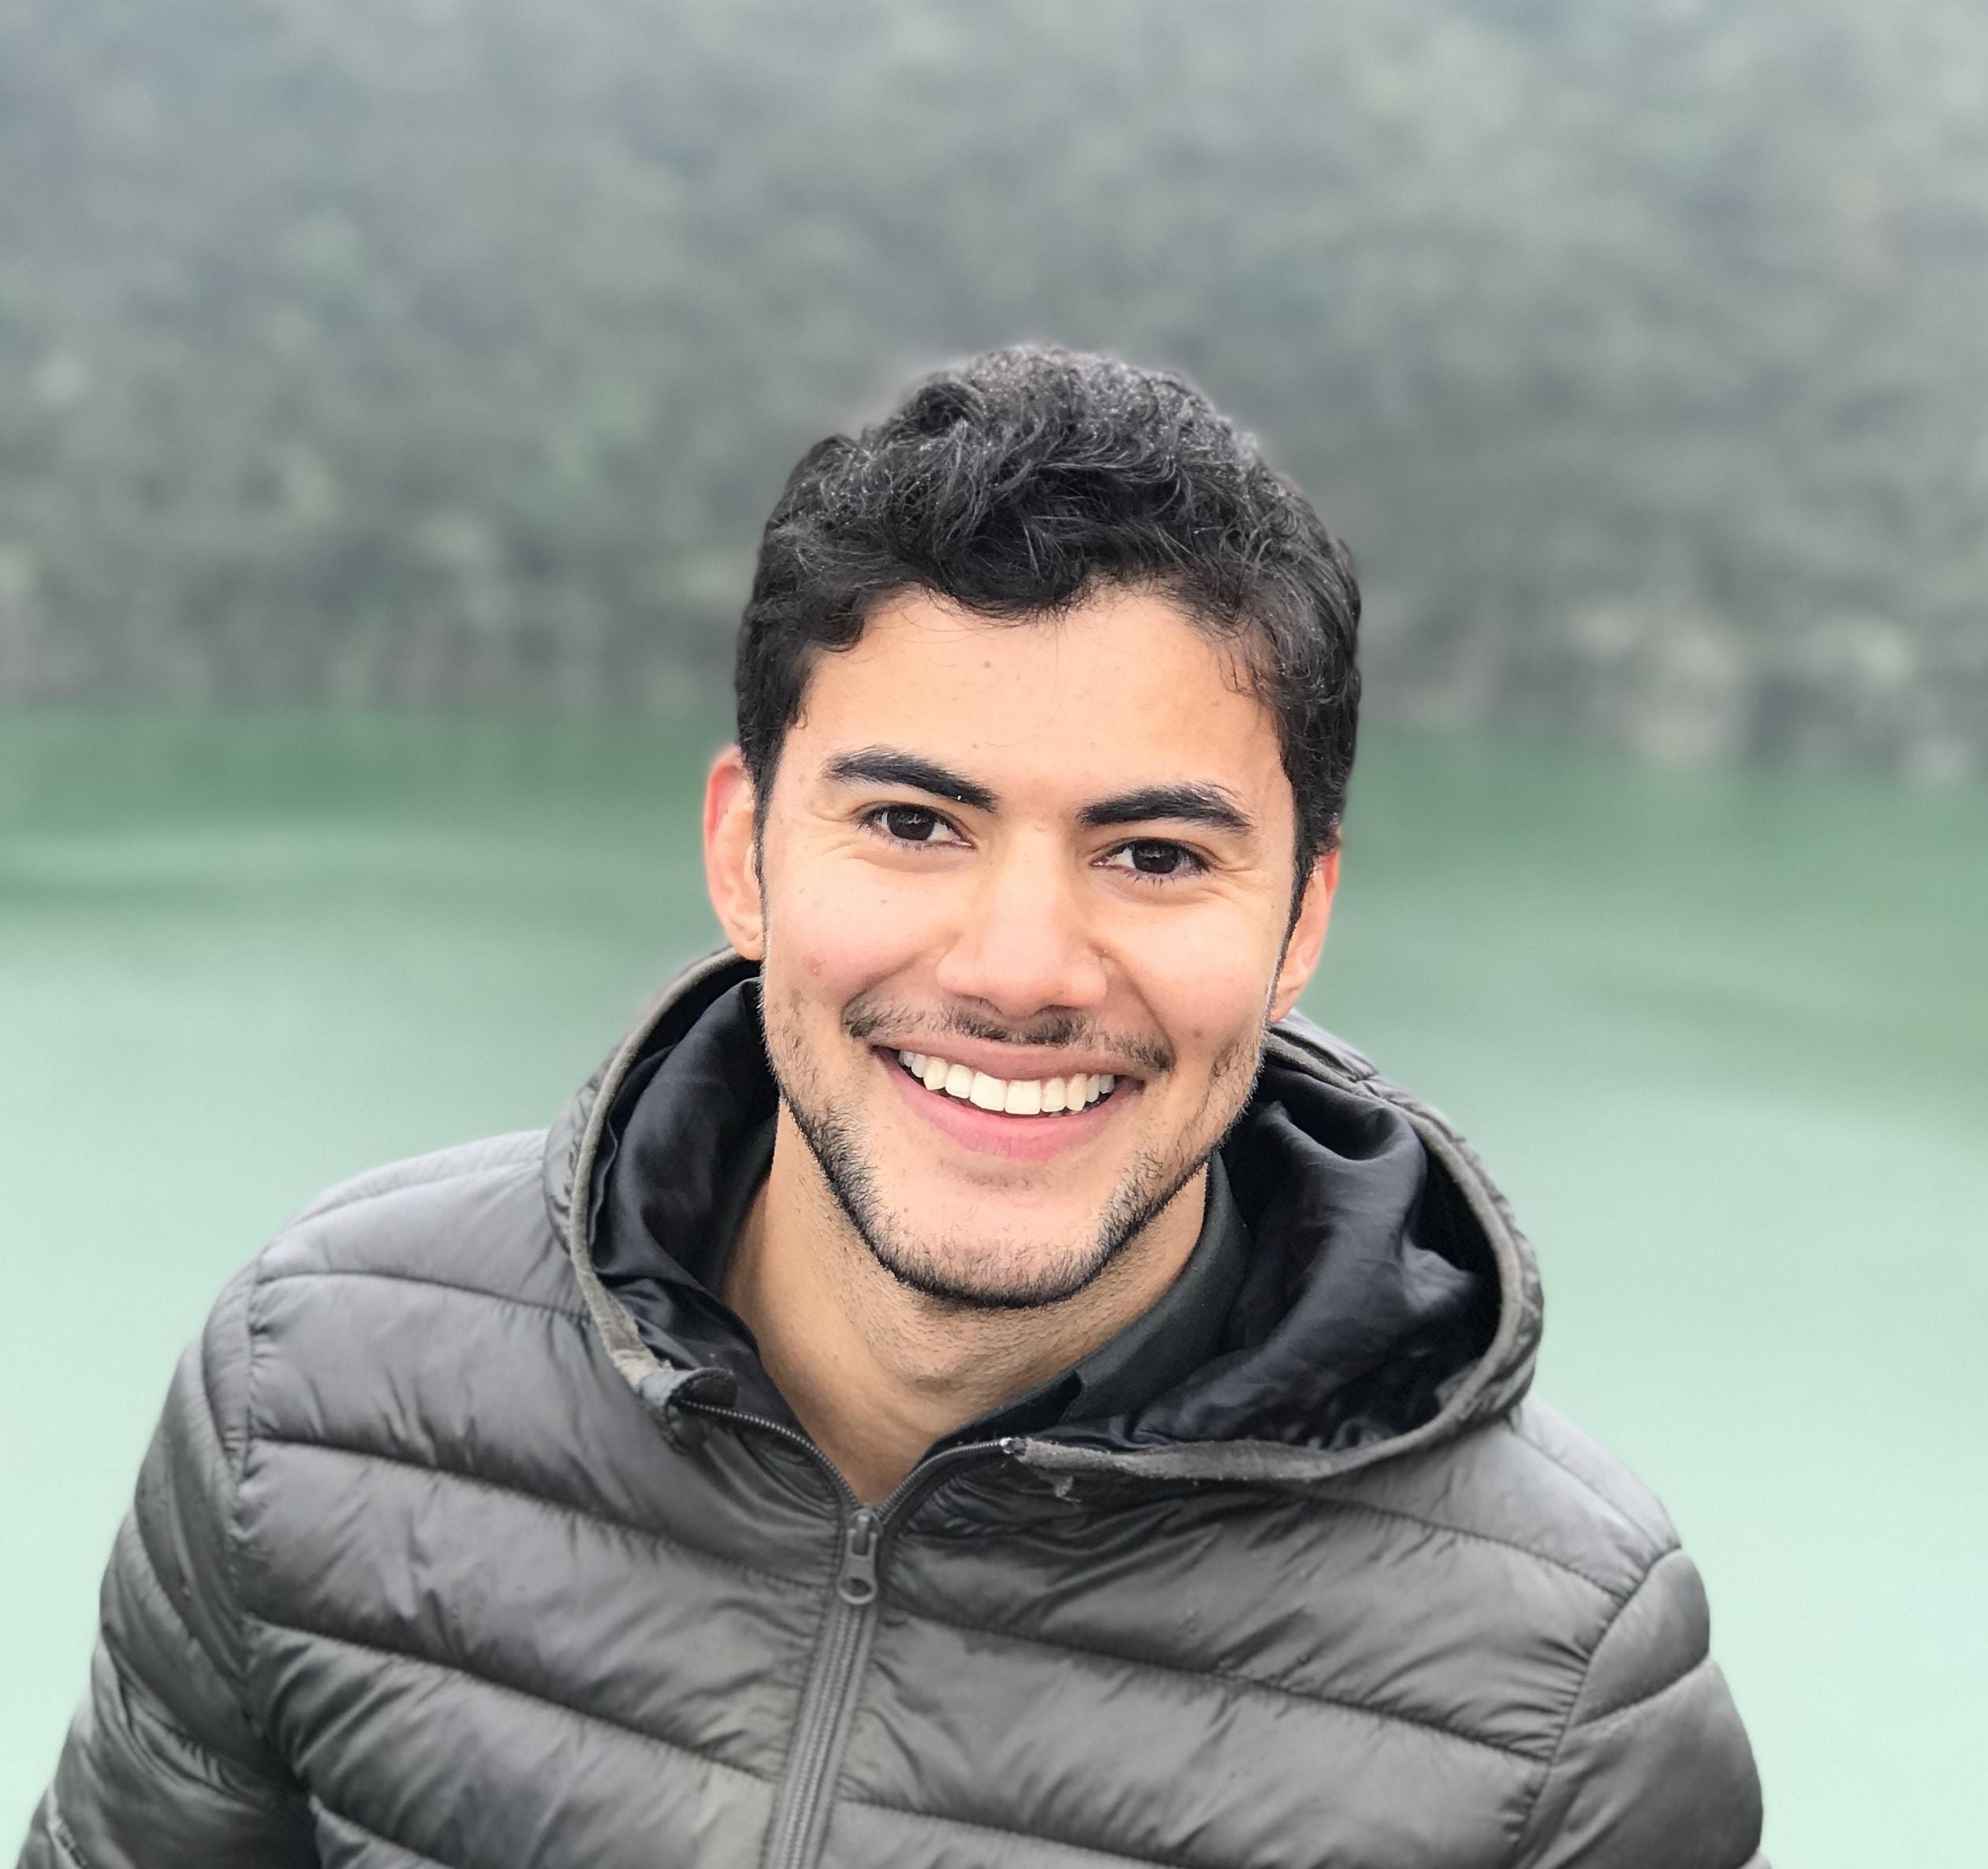 Go to Pablo Vallejo's profile